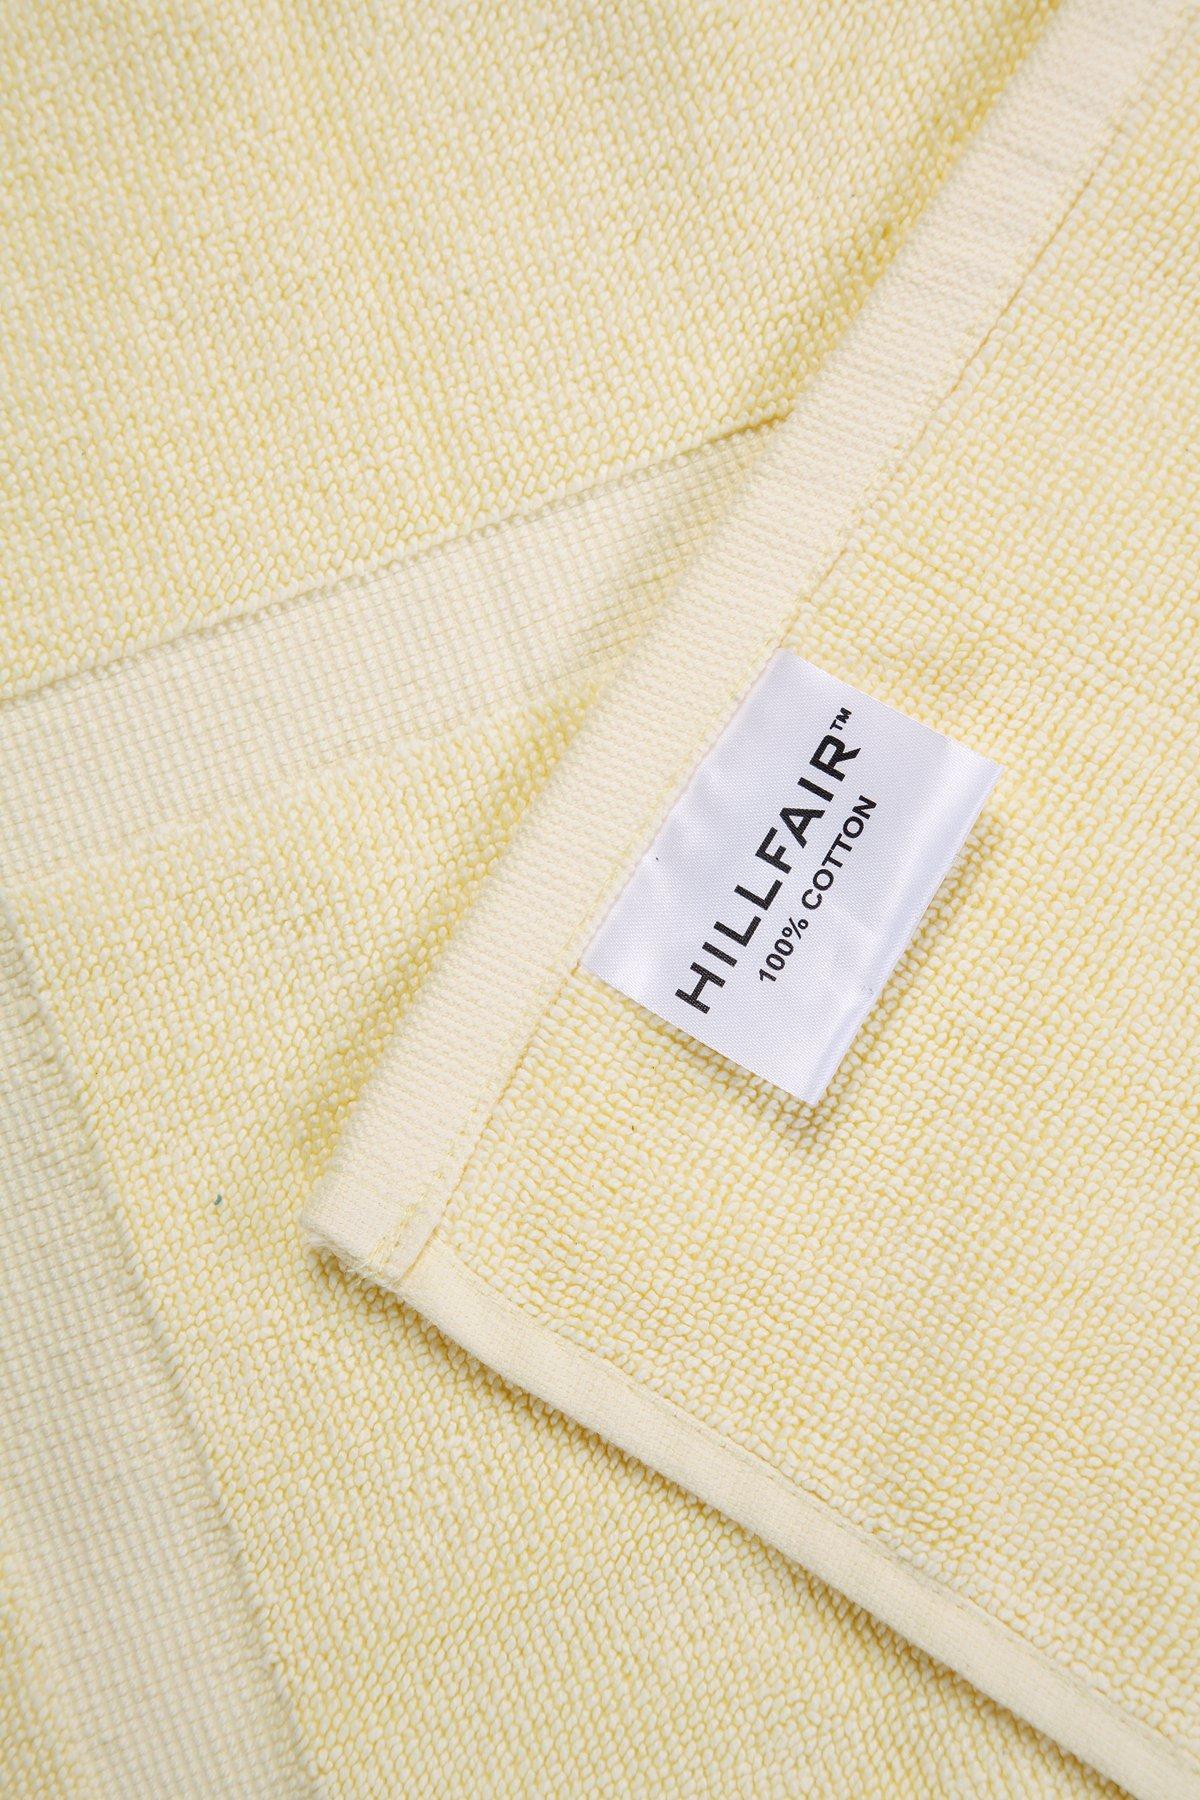 HILLFAIR Bath Towels Set (Bath Mat-Set of 2, Yellow) by HILLFAIR (Image #4)